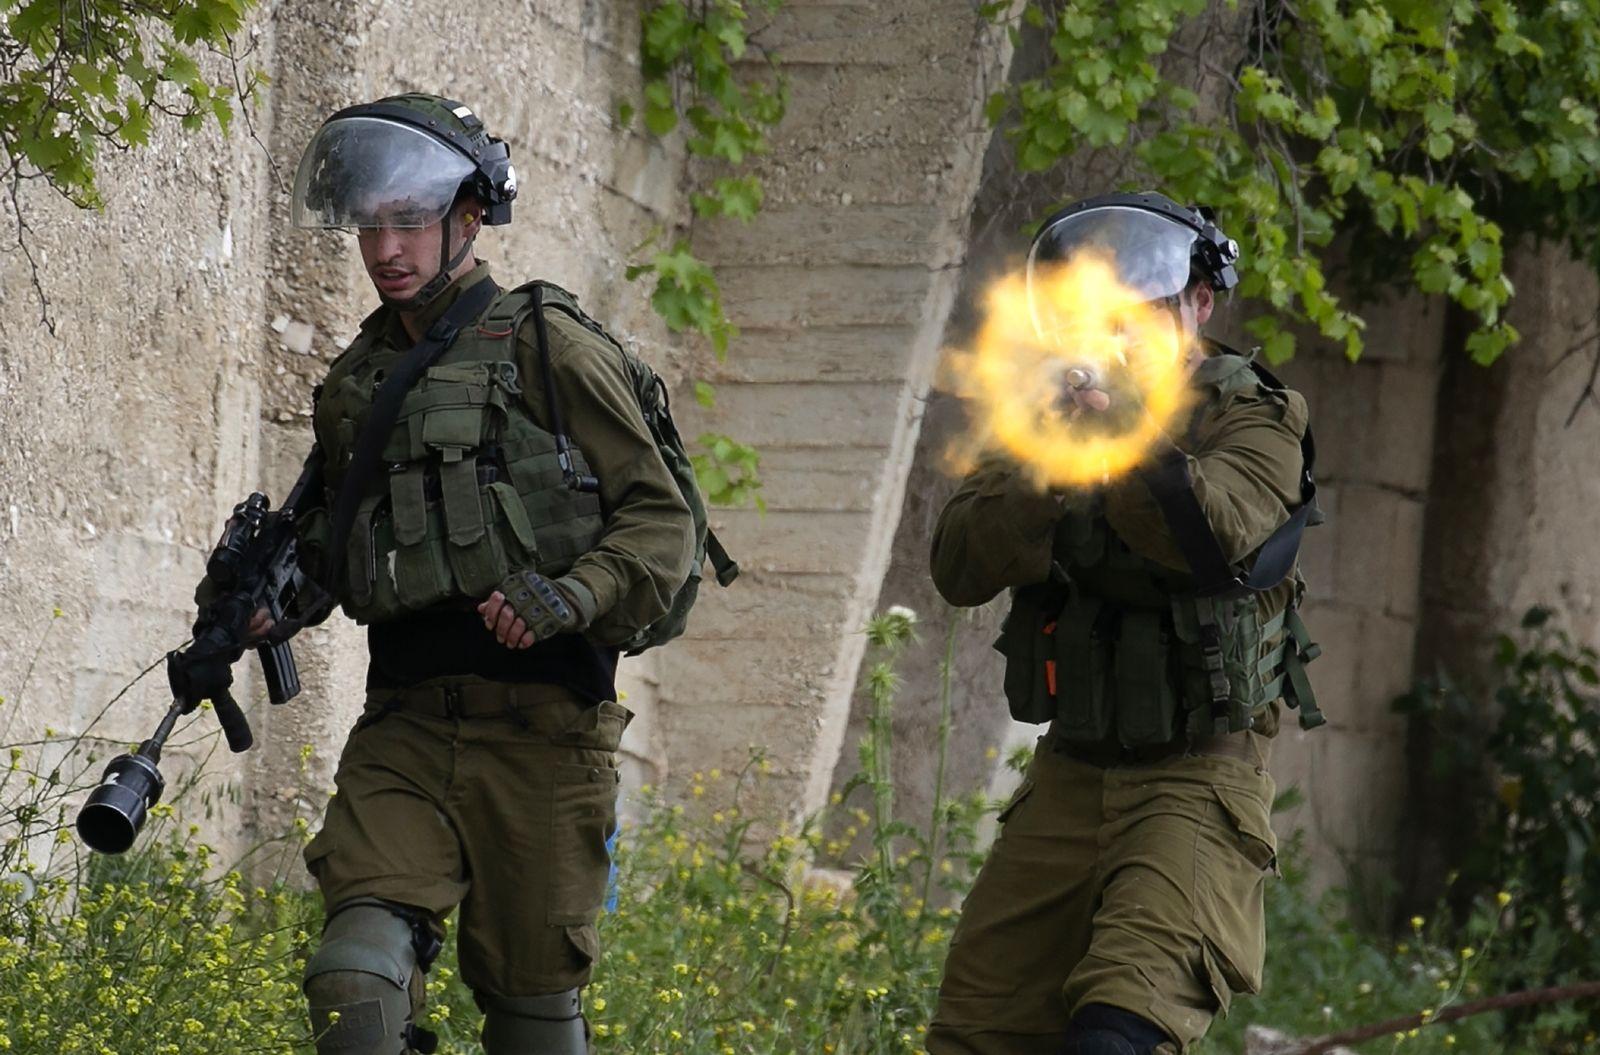 AFP-ทหารอิสราเอลยิงปืนใส่ผู้ชุมนุมปาเลสไตน์ช่วงล็อกดาวน์โควิด เขตเวสต์แบงก์.jpg